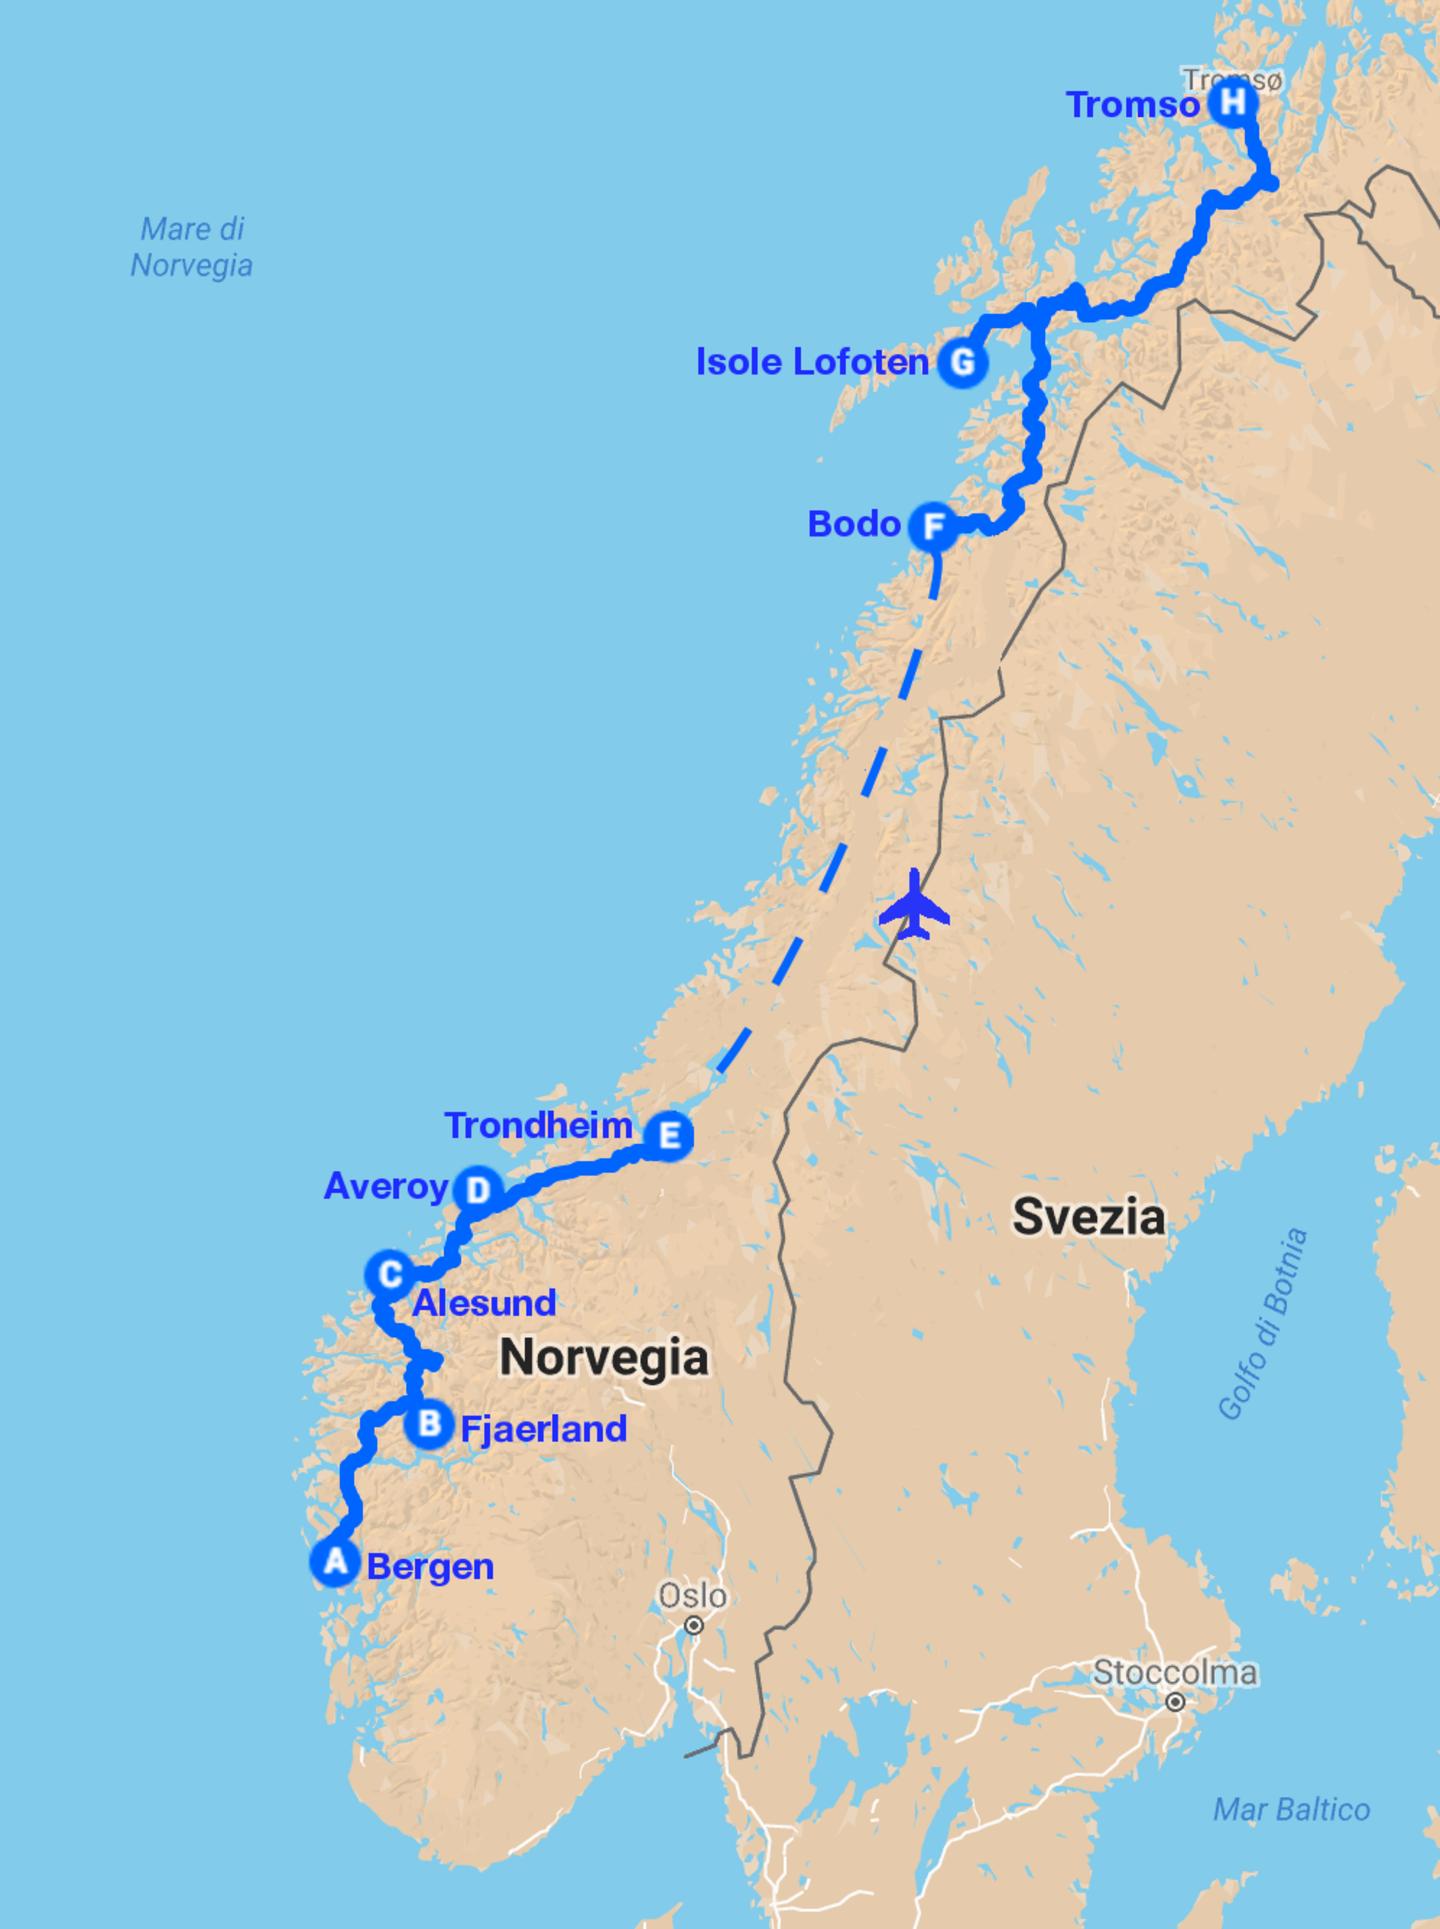 La Norvegia Cartina.Fly Drive Norvegia Direzione Nord Magnifici Fiordi E Terra Di Arcipelaghi Norama Tour Operator